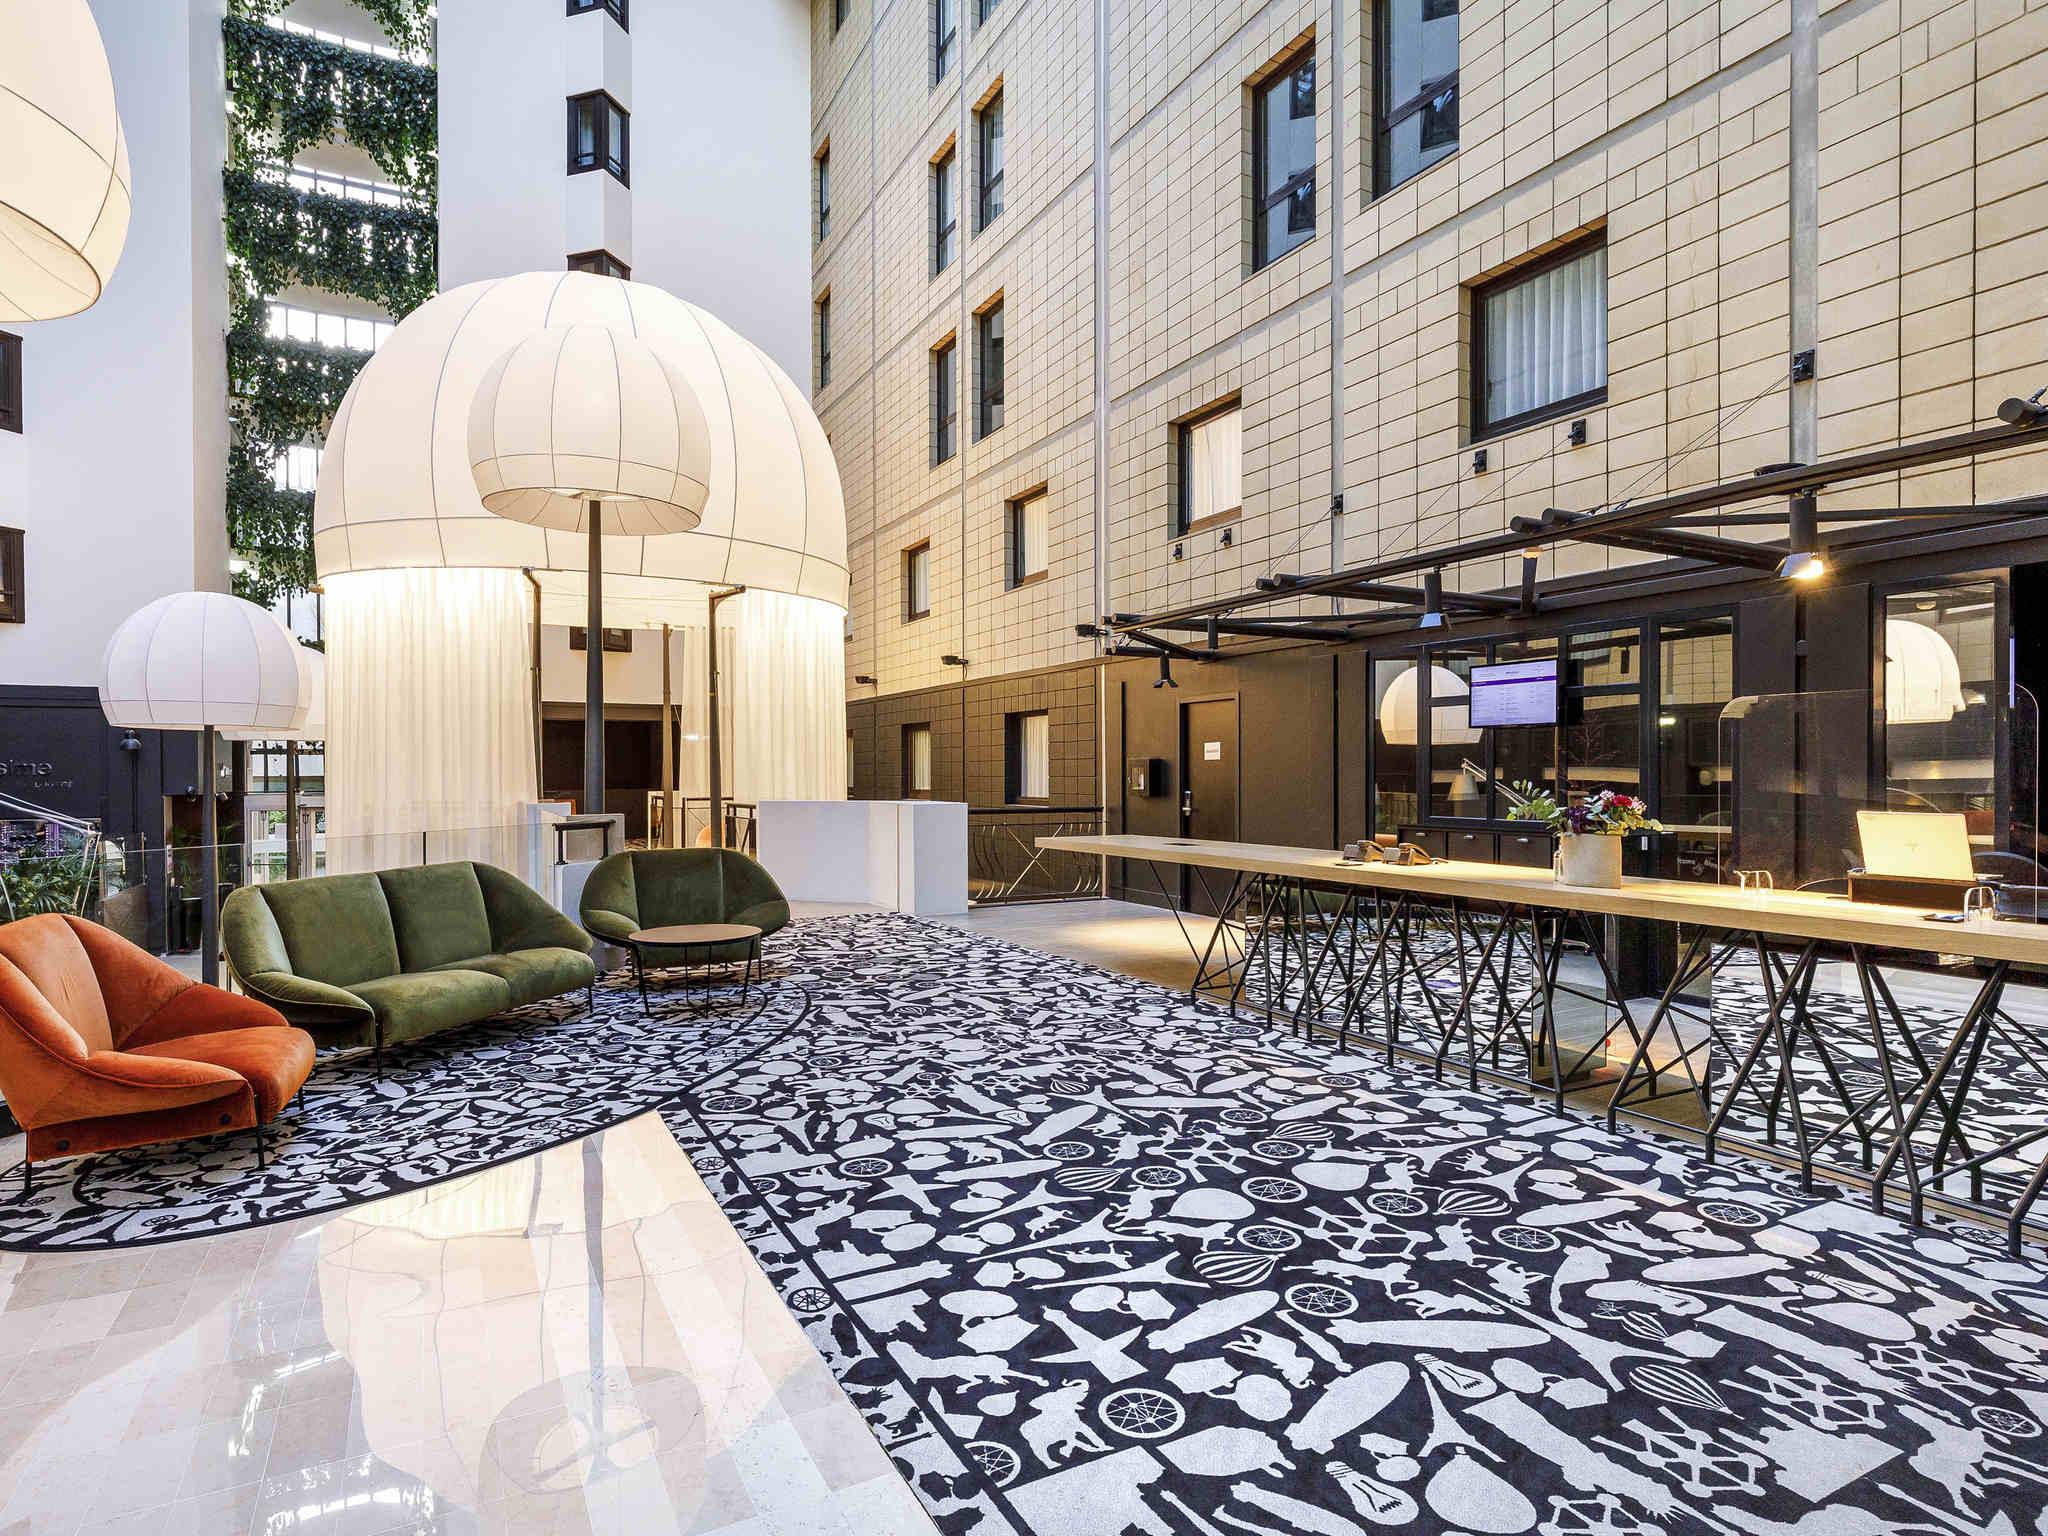 Hotel – Hotel Mercure Paris Porte de Versailles Expo